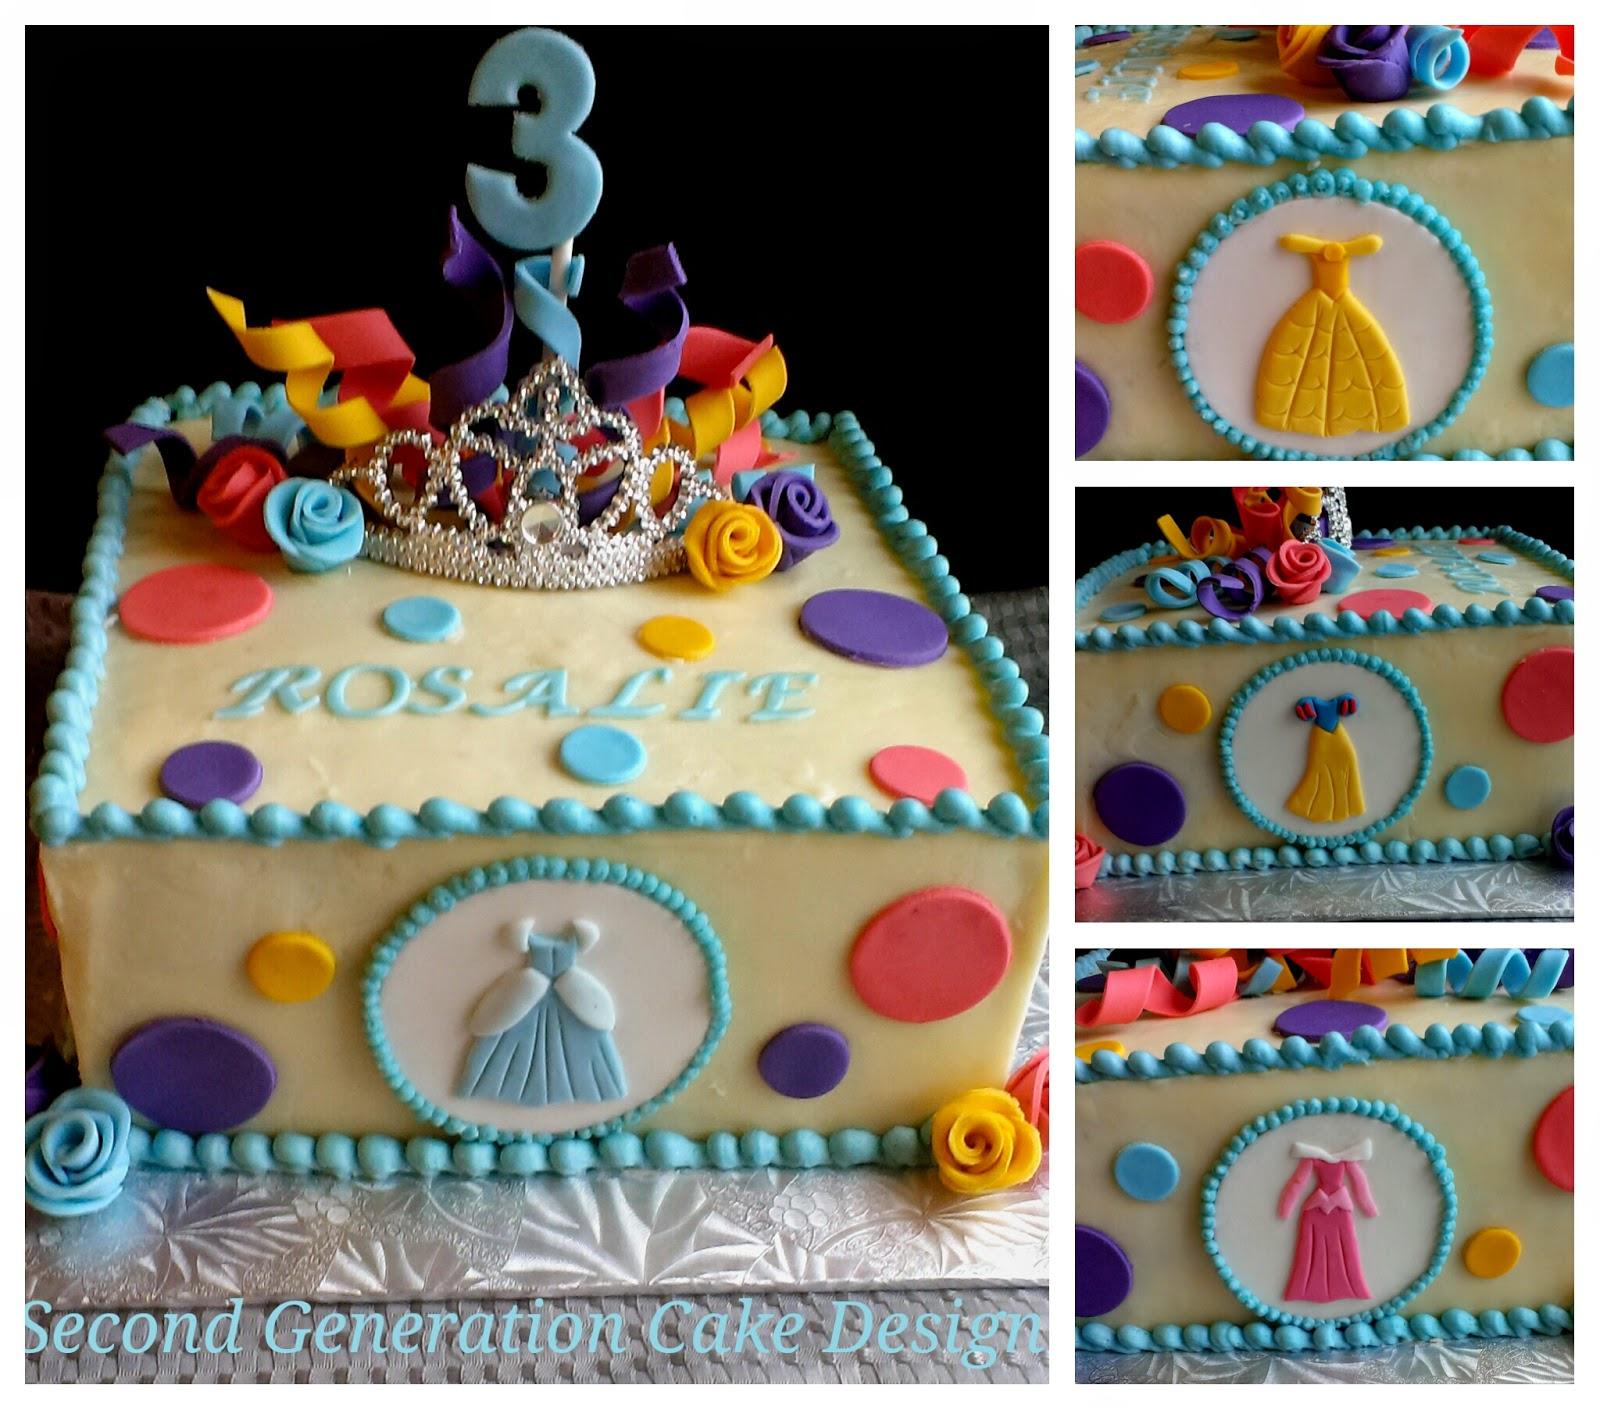 Second Generation Cake Design Princess Dress Birthday Cake